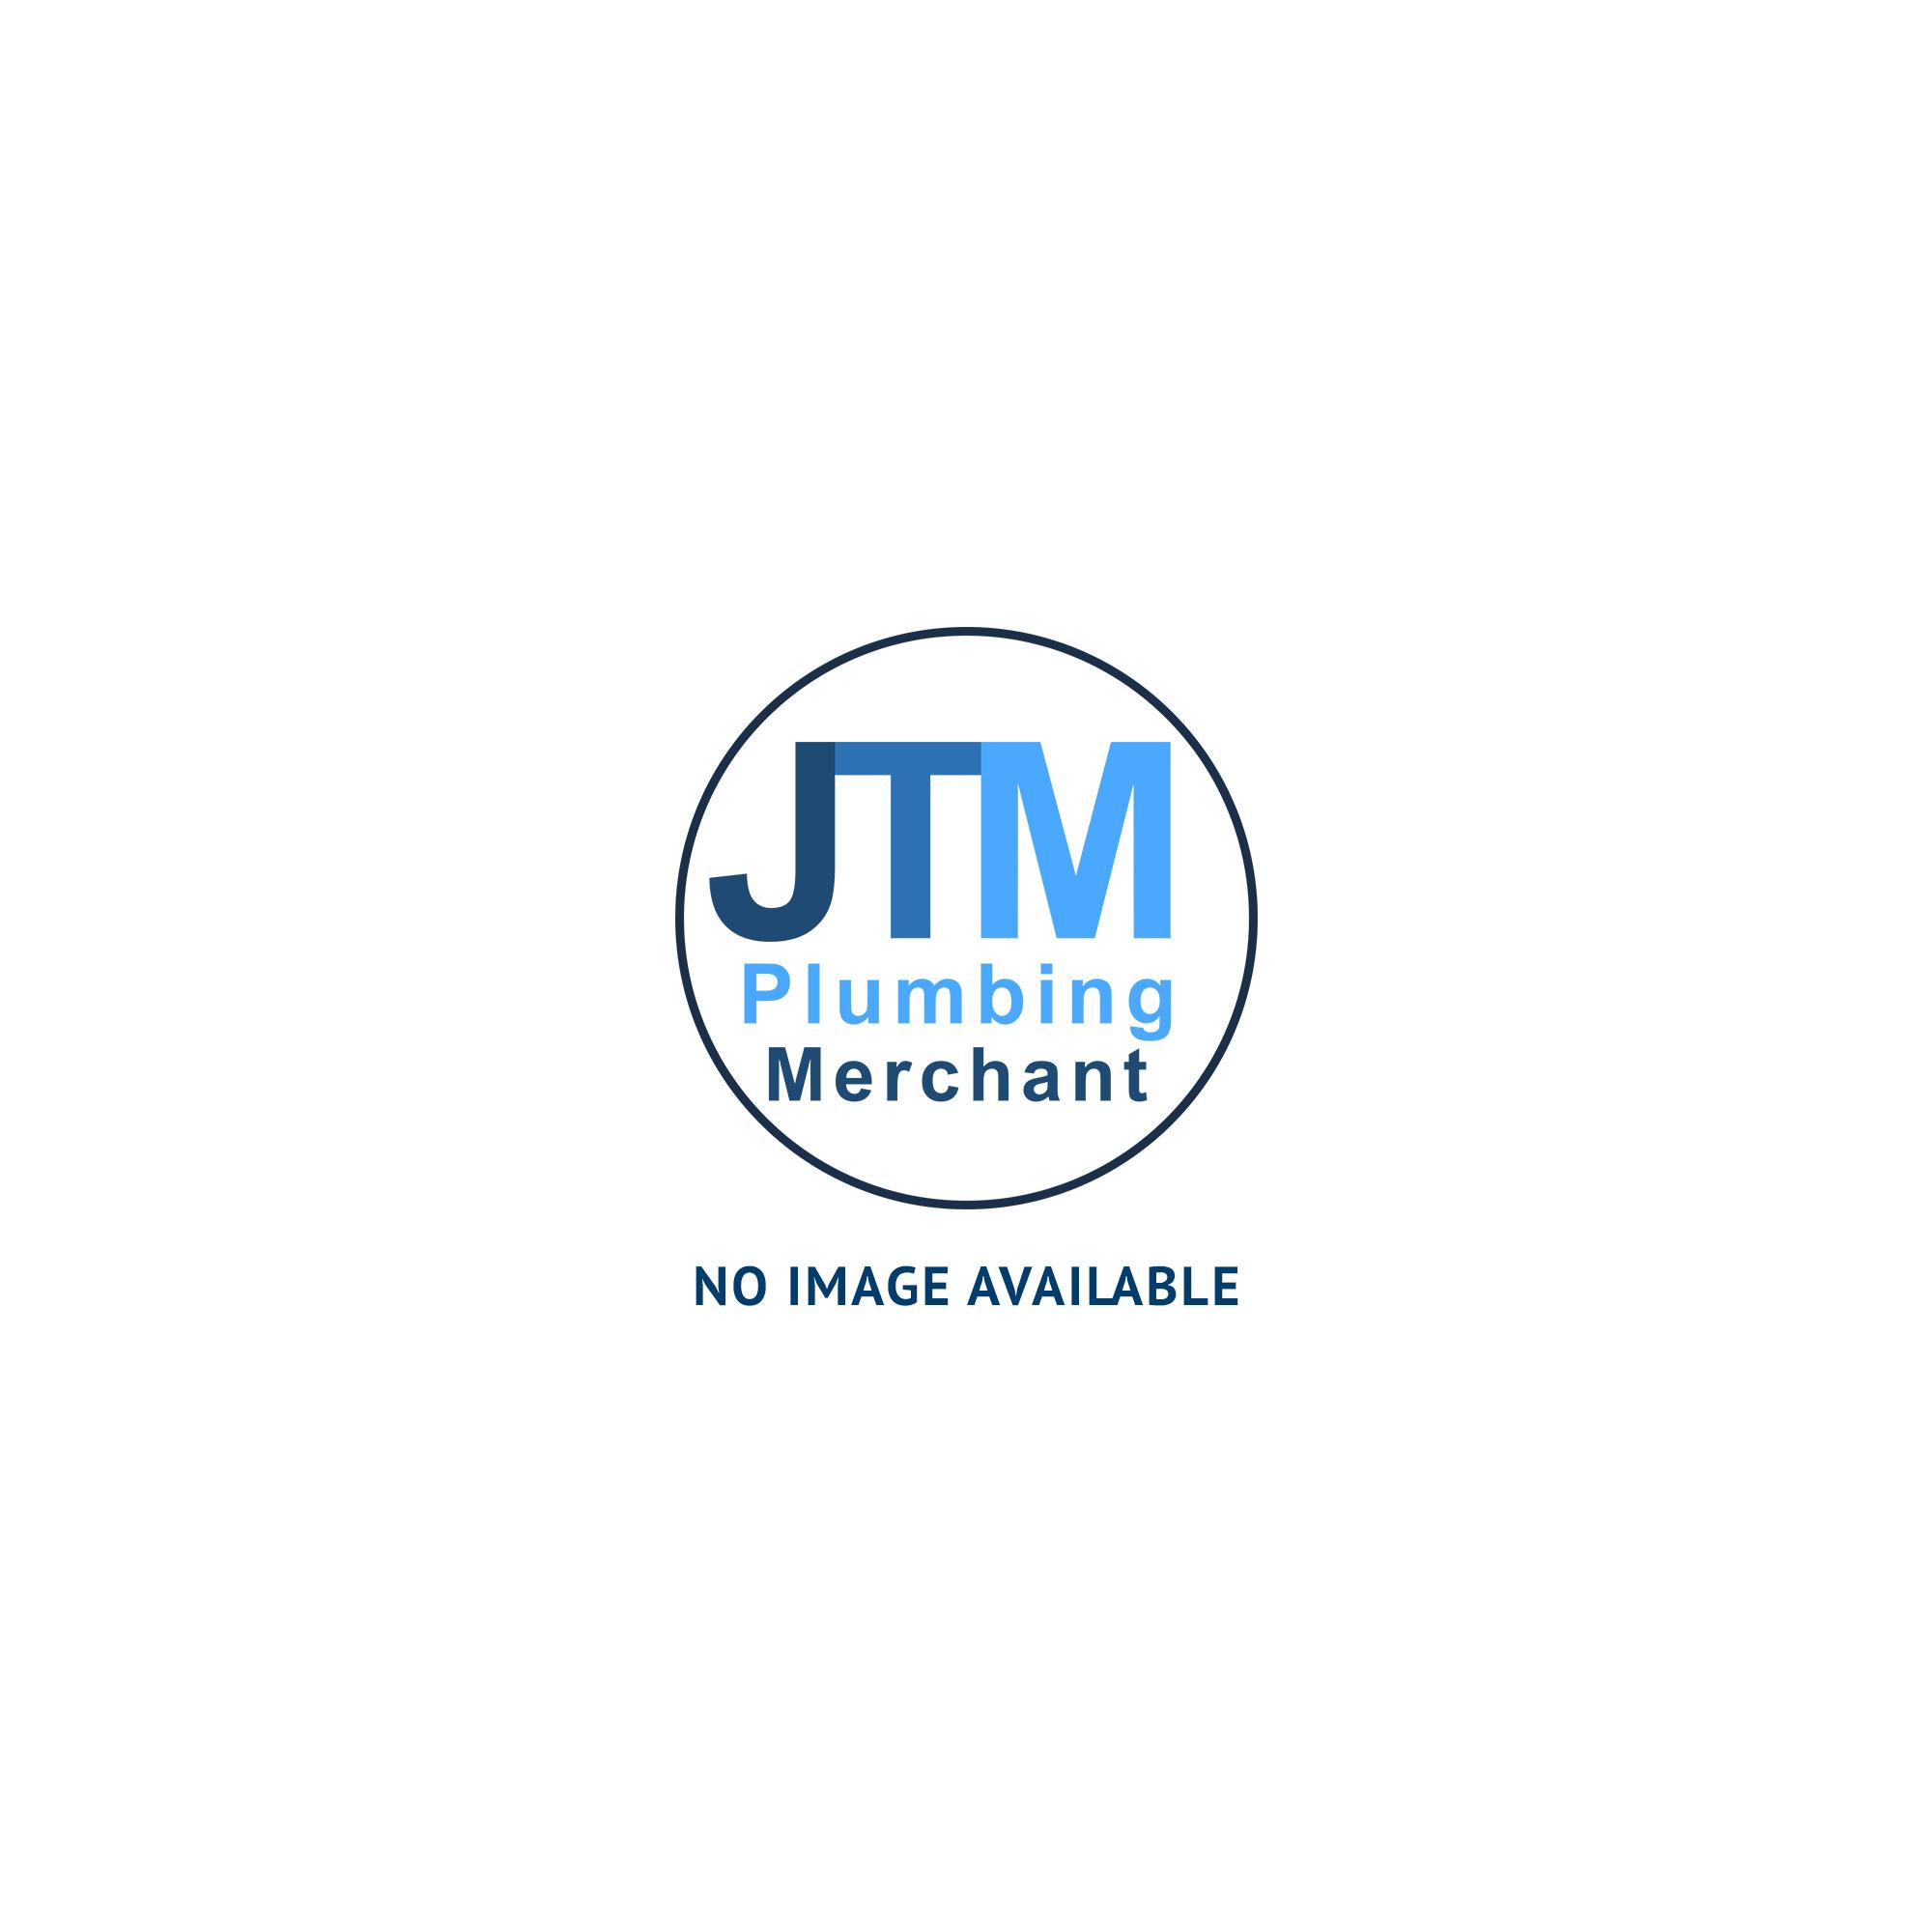 Thermostatic Mixing Valve Control: Reliance Water Controls (RWC) Heatguard TMV3-8